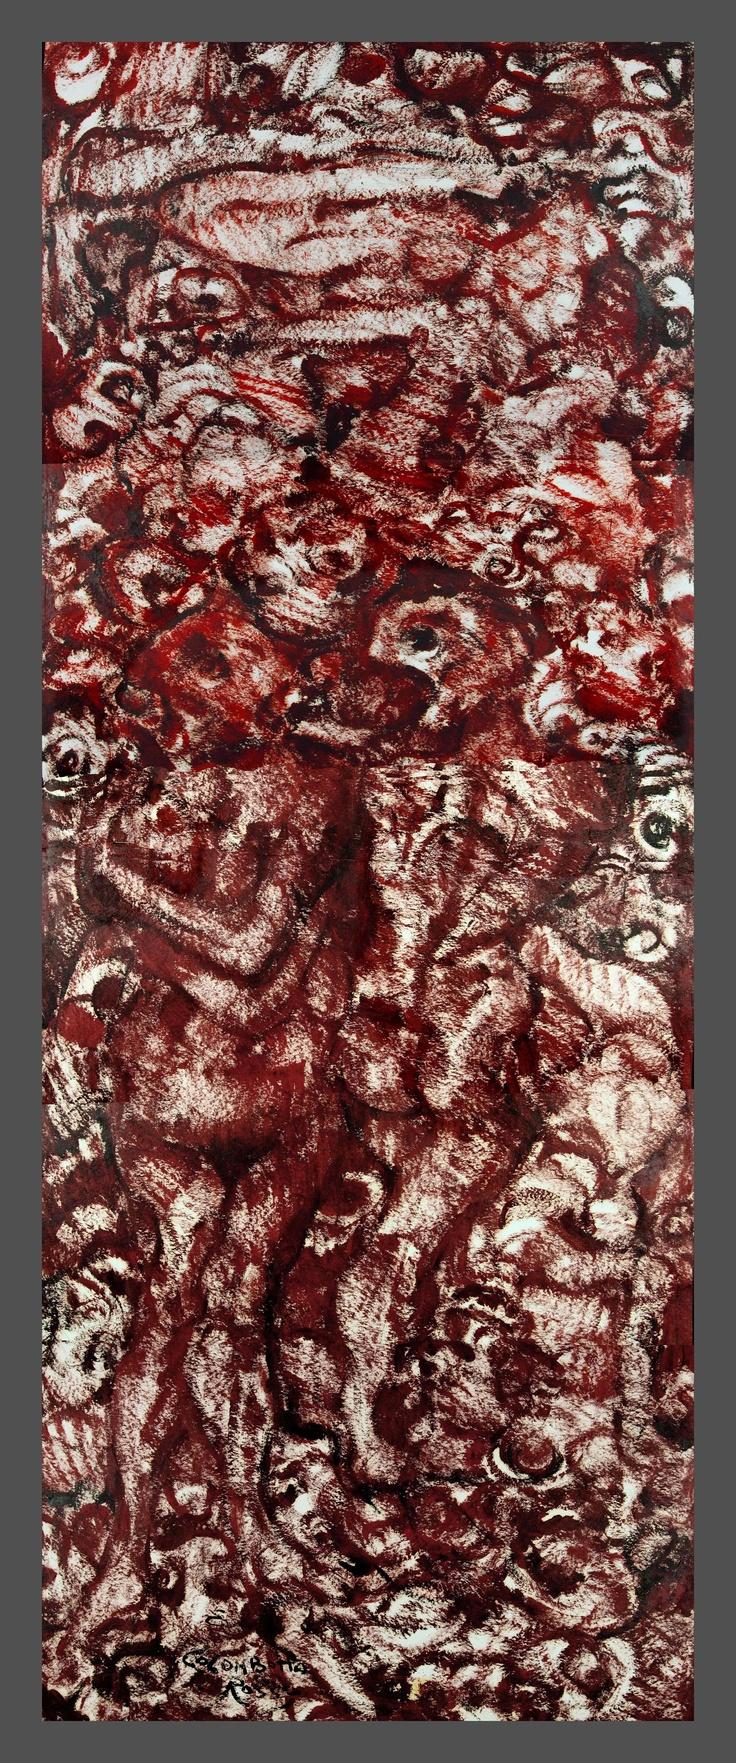 Enrico Colombotto Rosso, Inferno, tempera su cartoncino, sec. XX